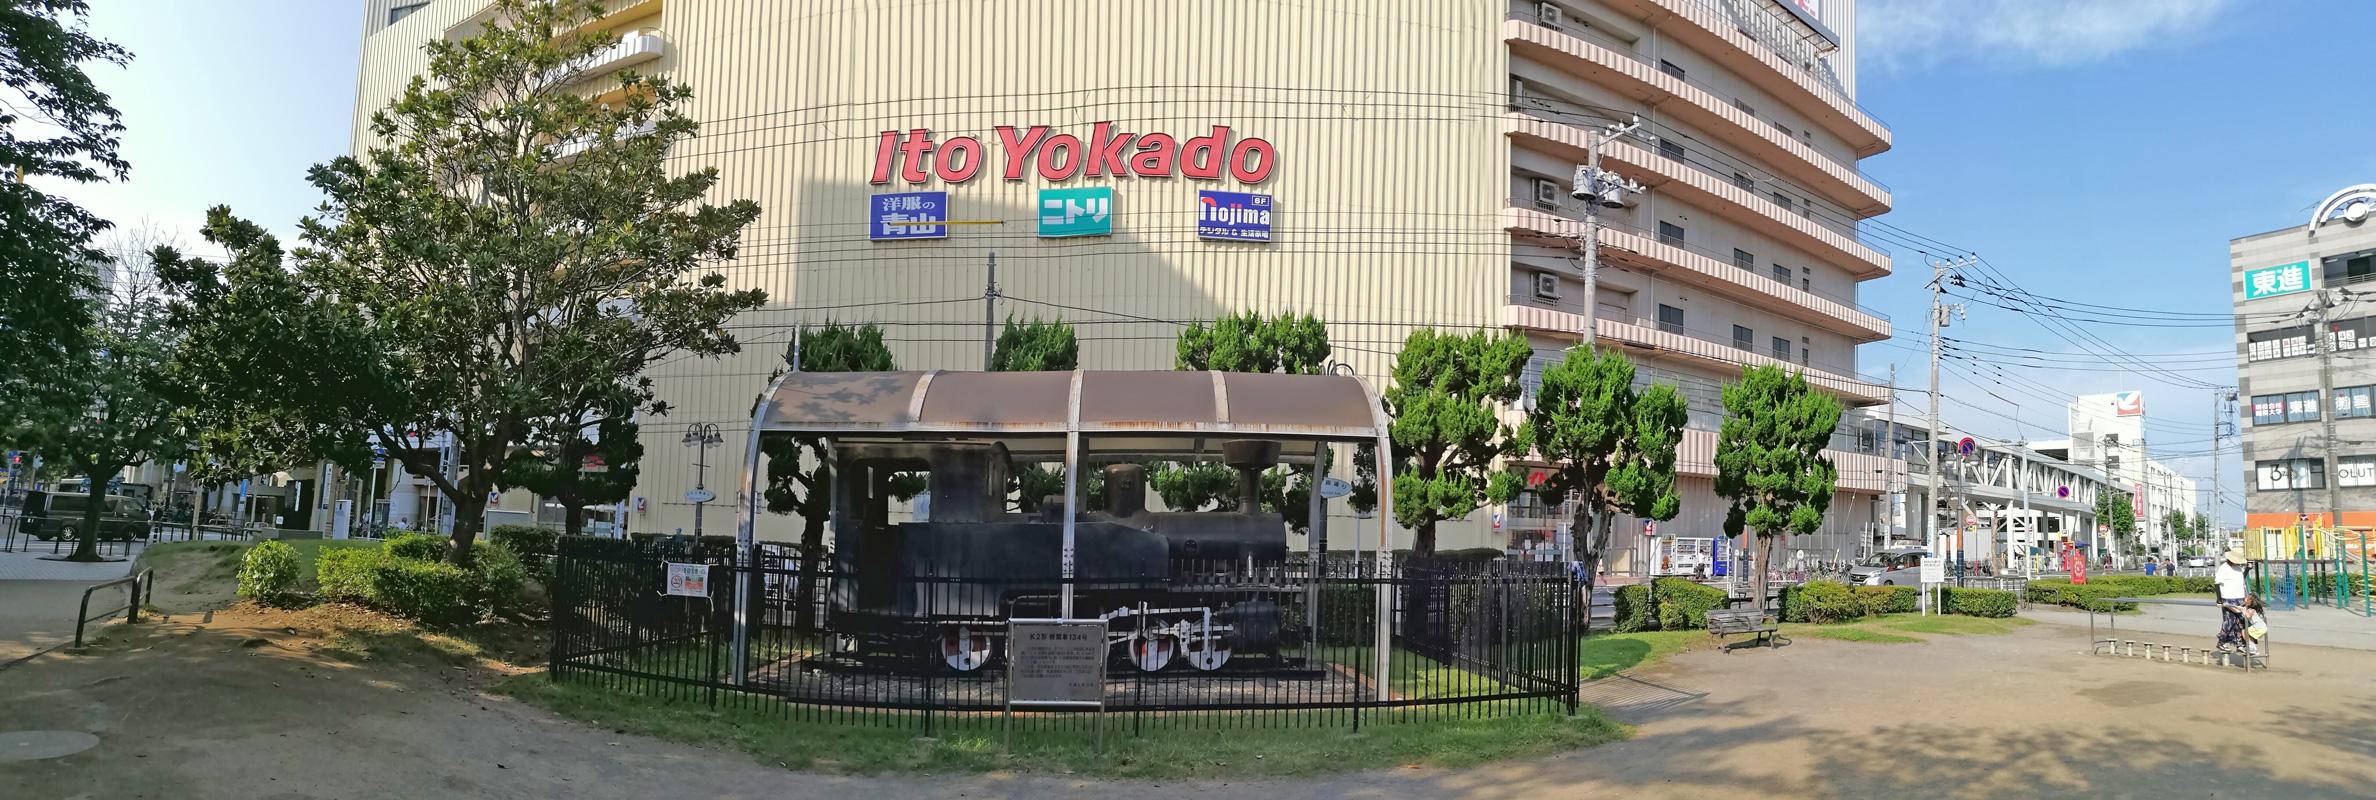 K2型蒸気機関車134号(千葉県習志野市 津田沼1丁目公園):HUAWEI P20 lite(ANE-LX2J)、3.81mm(35mm判26mm相当)、プログラムAE、AWB、パノラマモード、シャッタースピード・絞り値・ISO感度不明